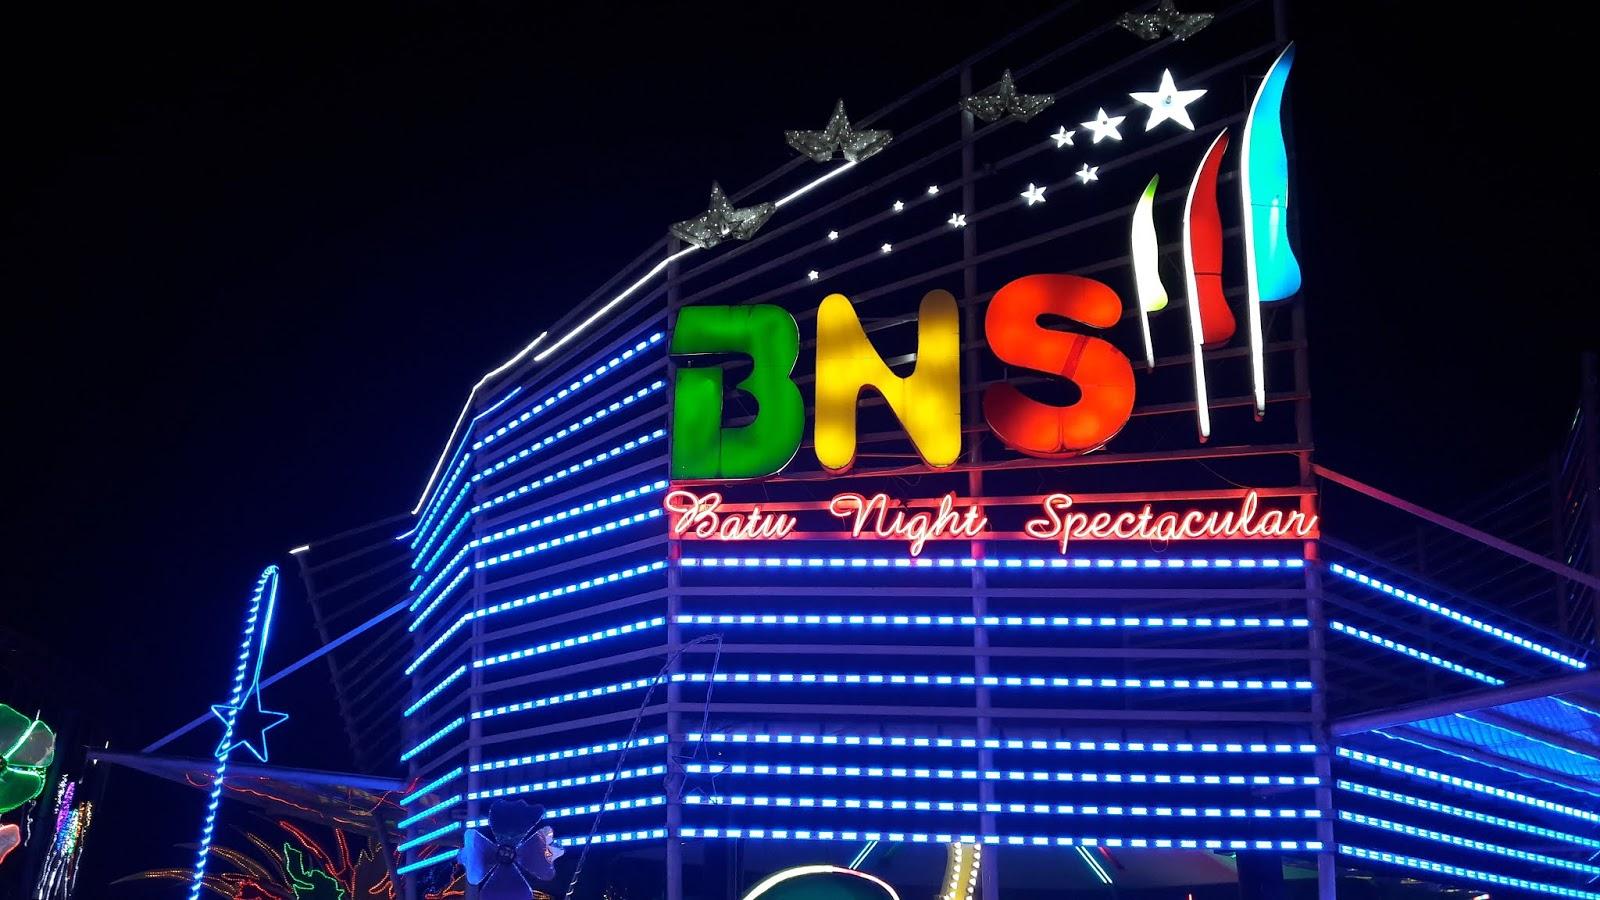 Batu Night Spectacular - Rekomendasi Wisata Batu Paling Favorit Wajib Dikunjungi Para Pelancong